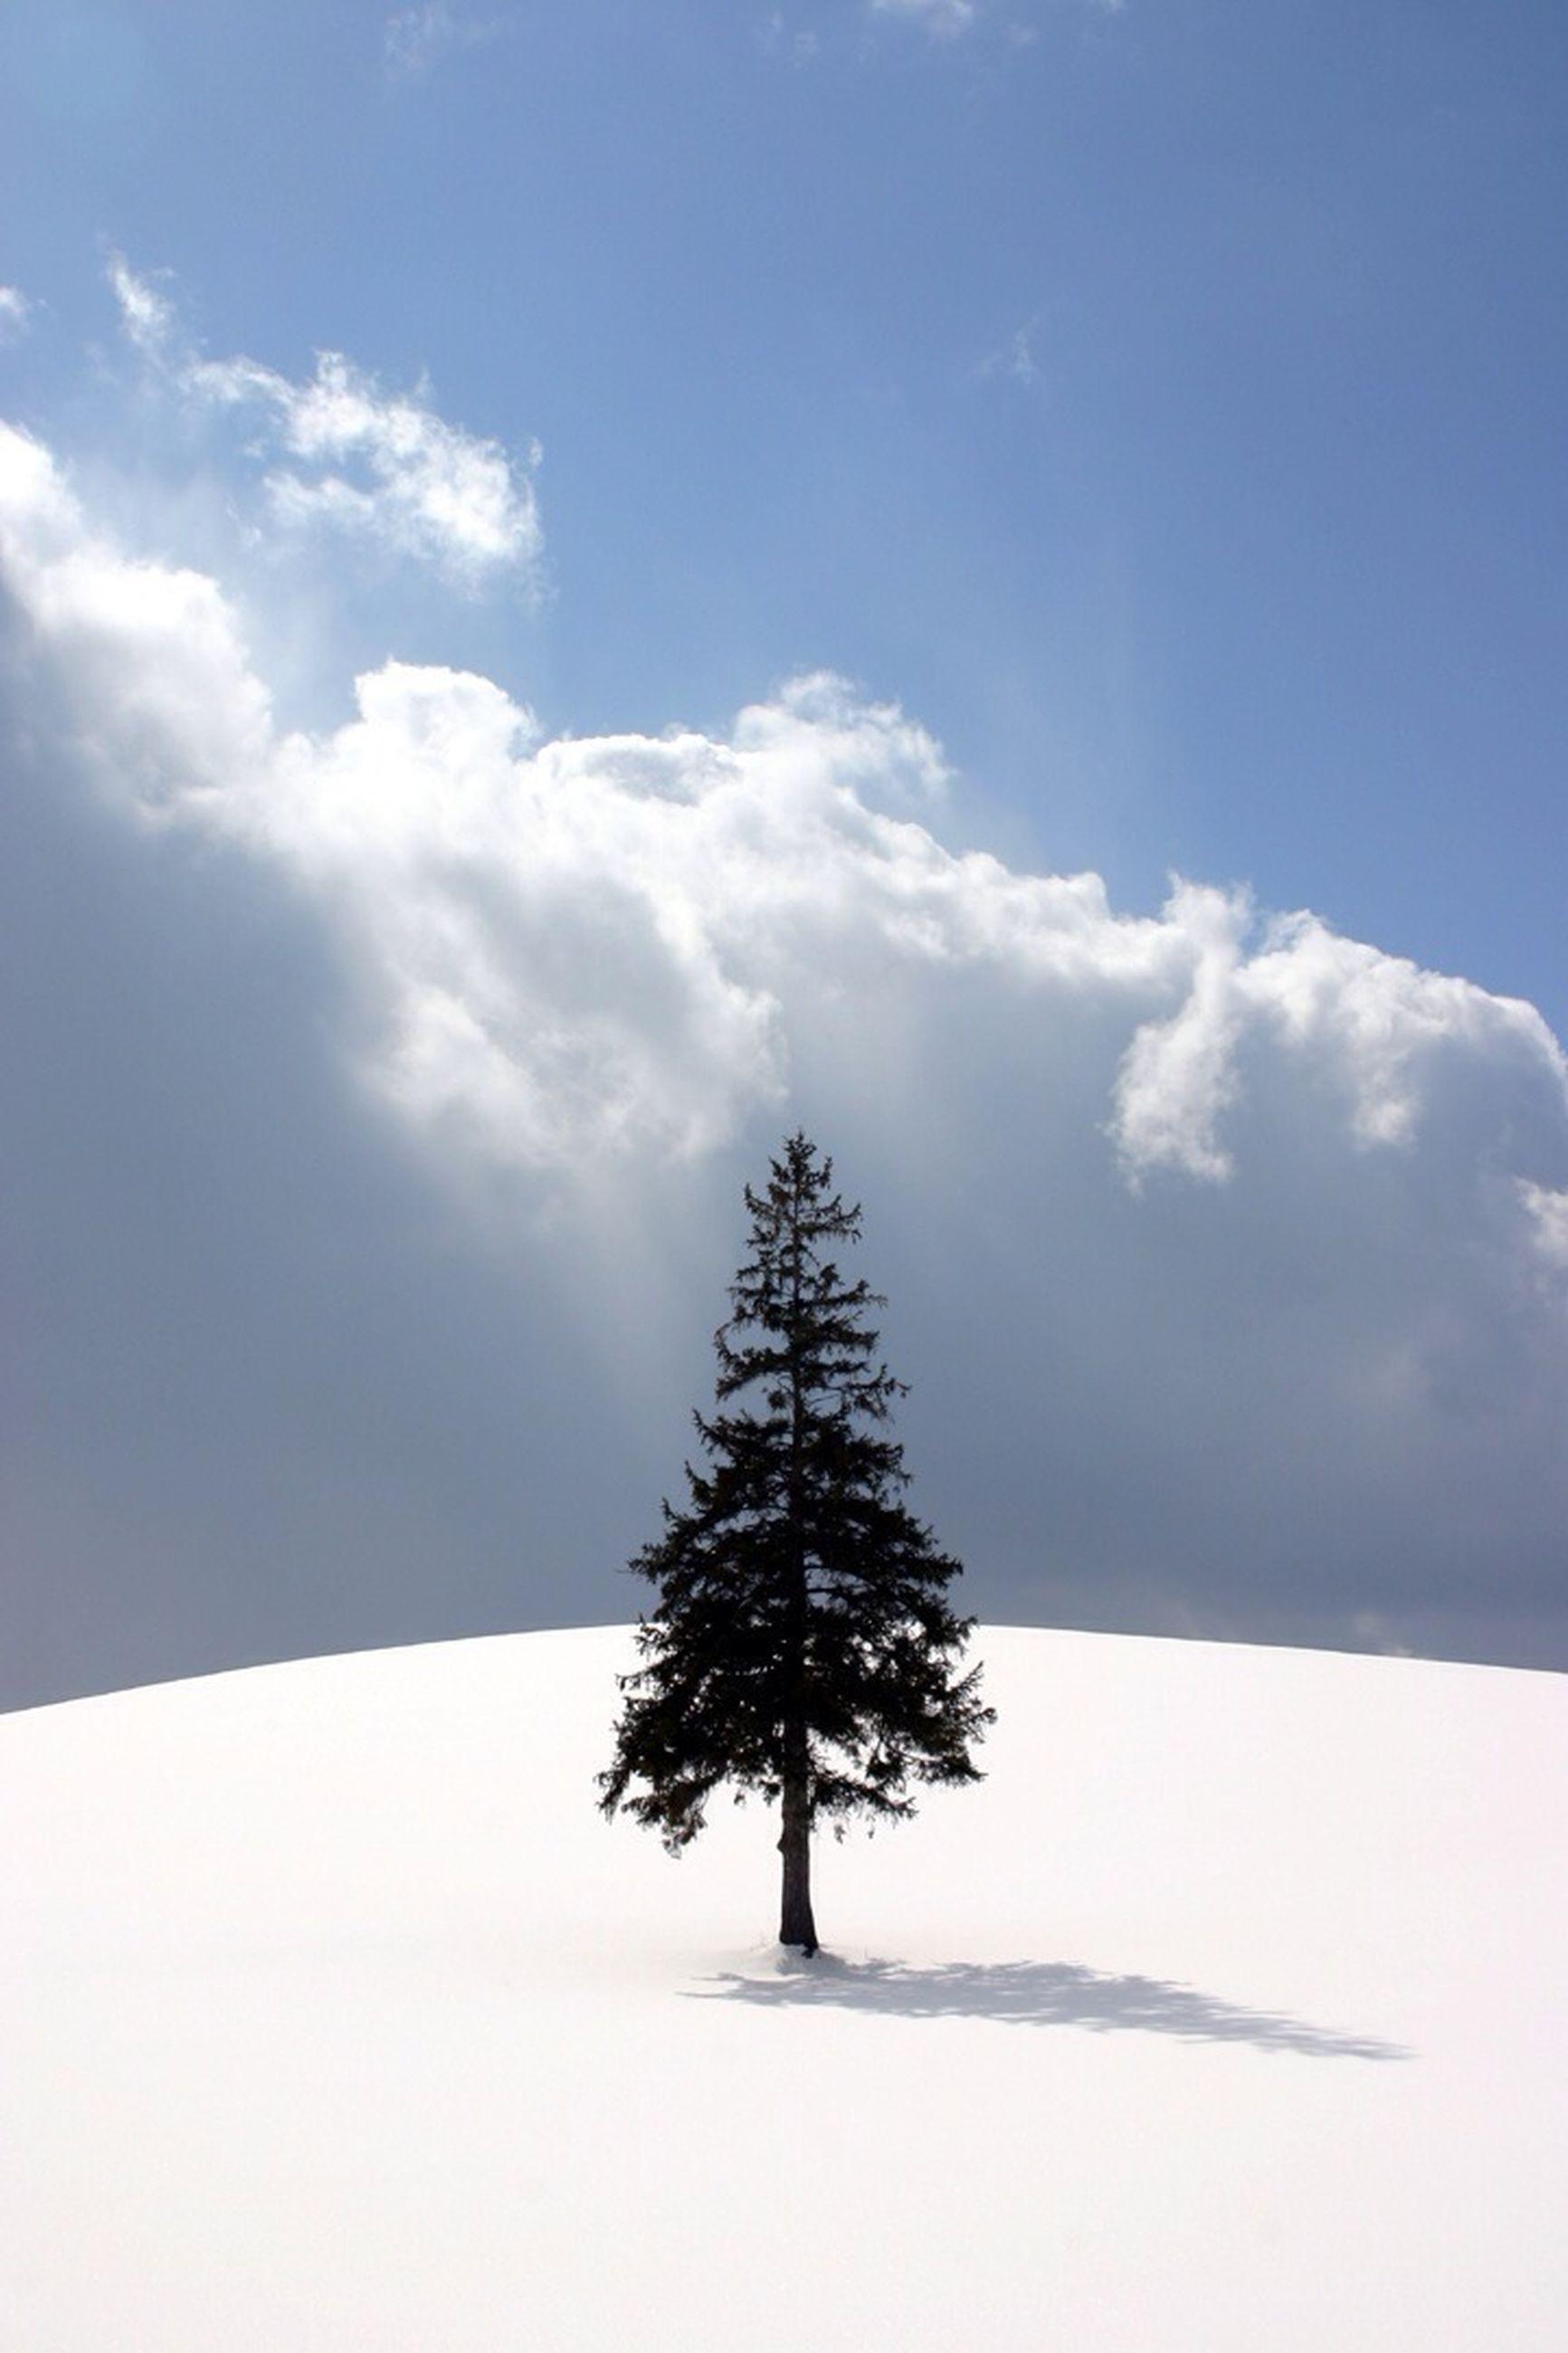 snow, winter, cold temperature, tranquility, tree, tranquil scene, sky, beauty in nature, scenics, nature, landscape, weather, season, cloud - sky, covering, white color, field, non-urban scene, cloud, sunlight